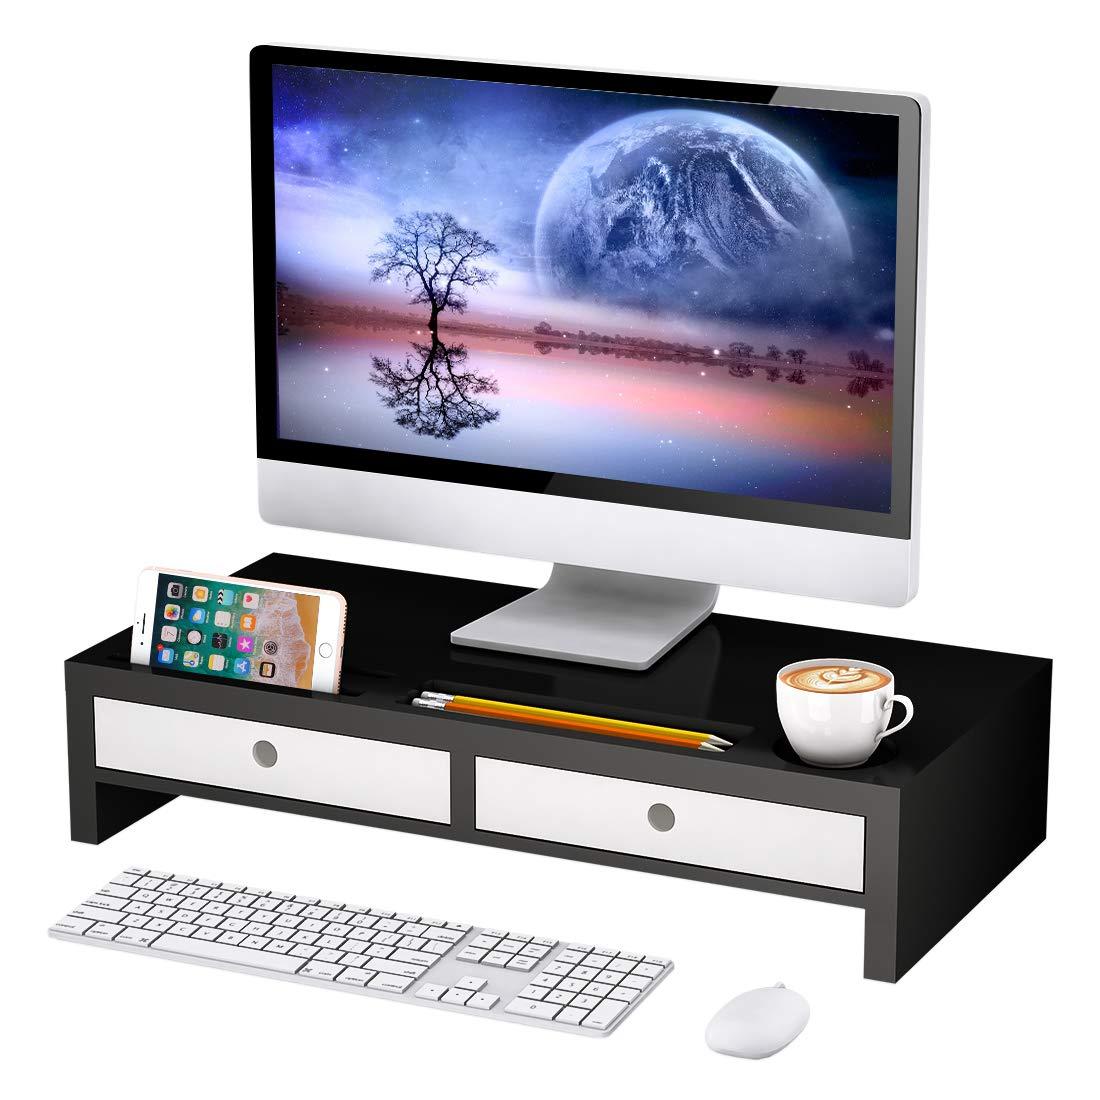 Monitor Stand Riser with Drawer - Desk Shelf Organizer,Keyboard Storage,Stylish Black,22'' x 10.6'' x 4.7'' by Bambloom